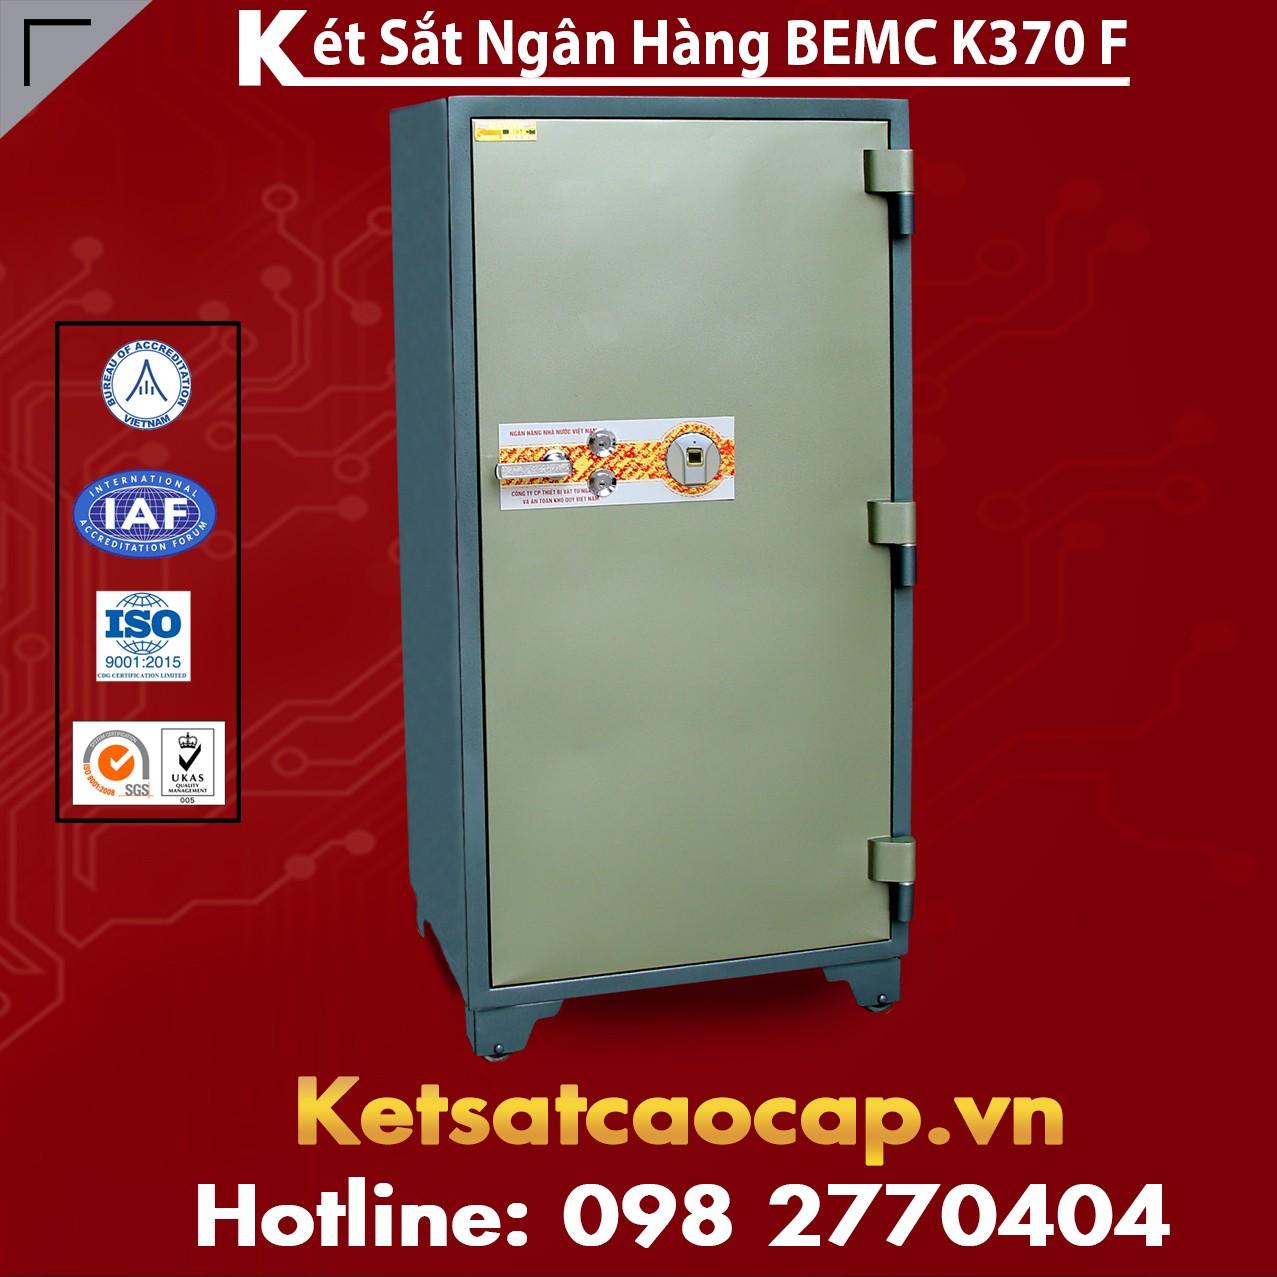 Két Sắt Vân Tay Bank Safes BEMC K370 F Vị Trí Đặt Két Hợp Phong Thủy